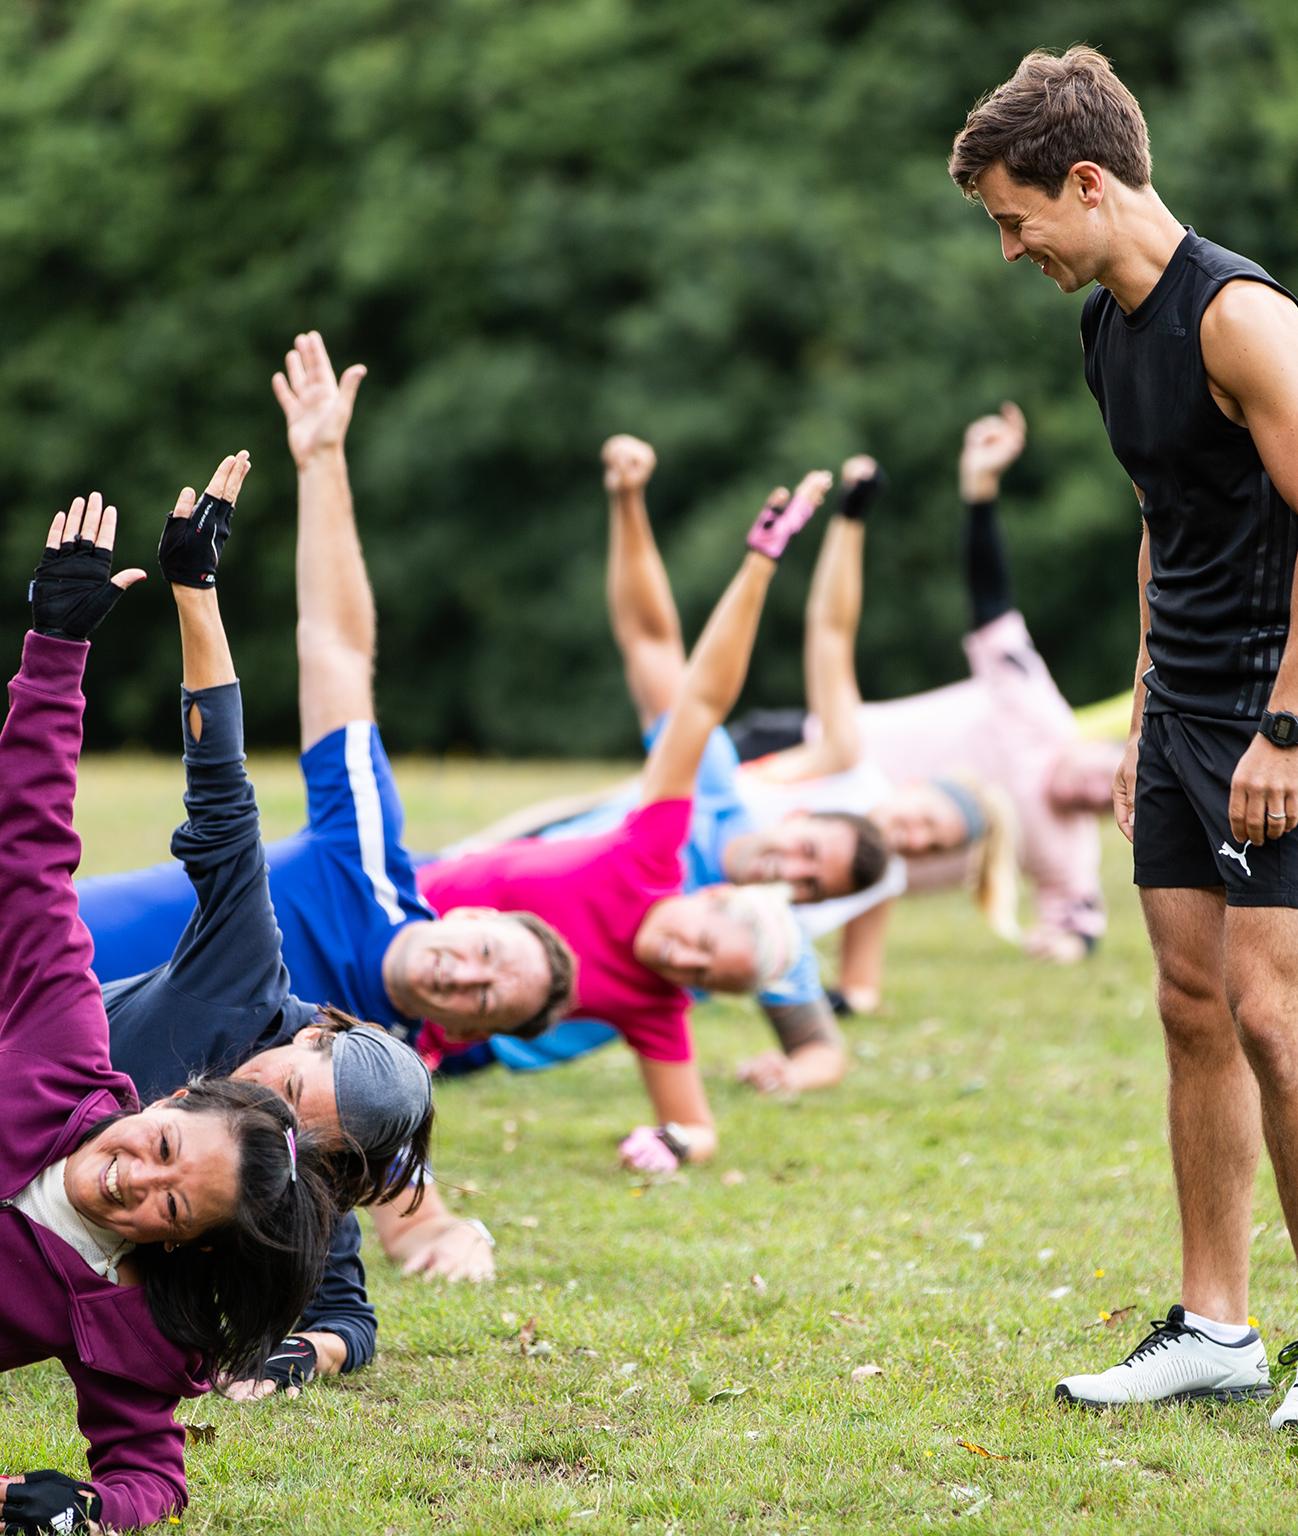 Chislehurst Fitness - Group Fitness Bootcamp - Side plank